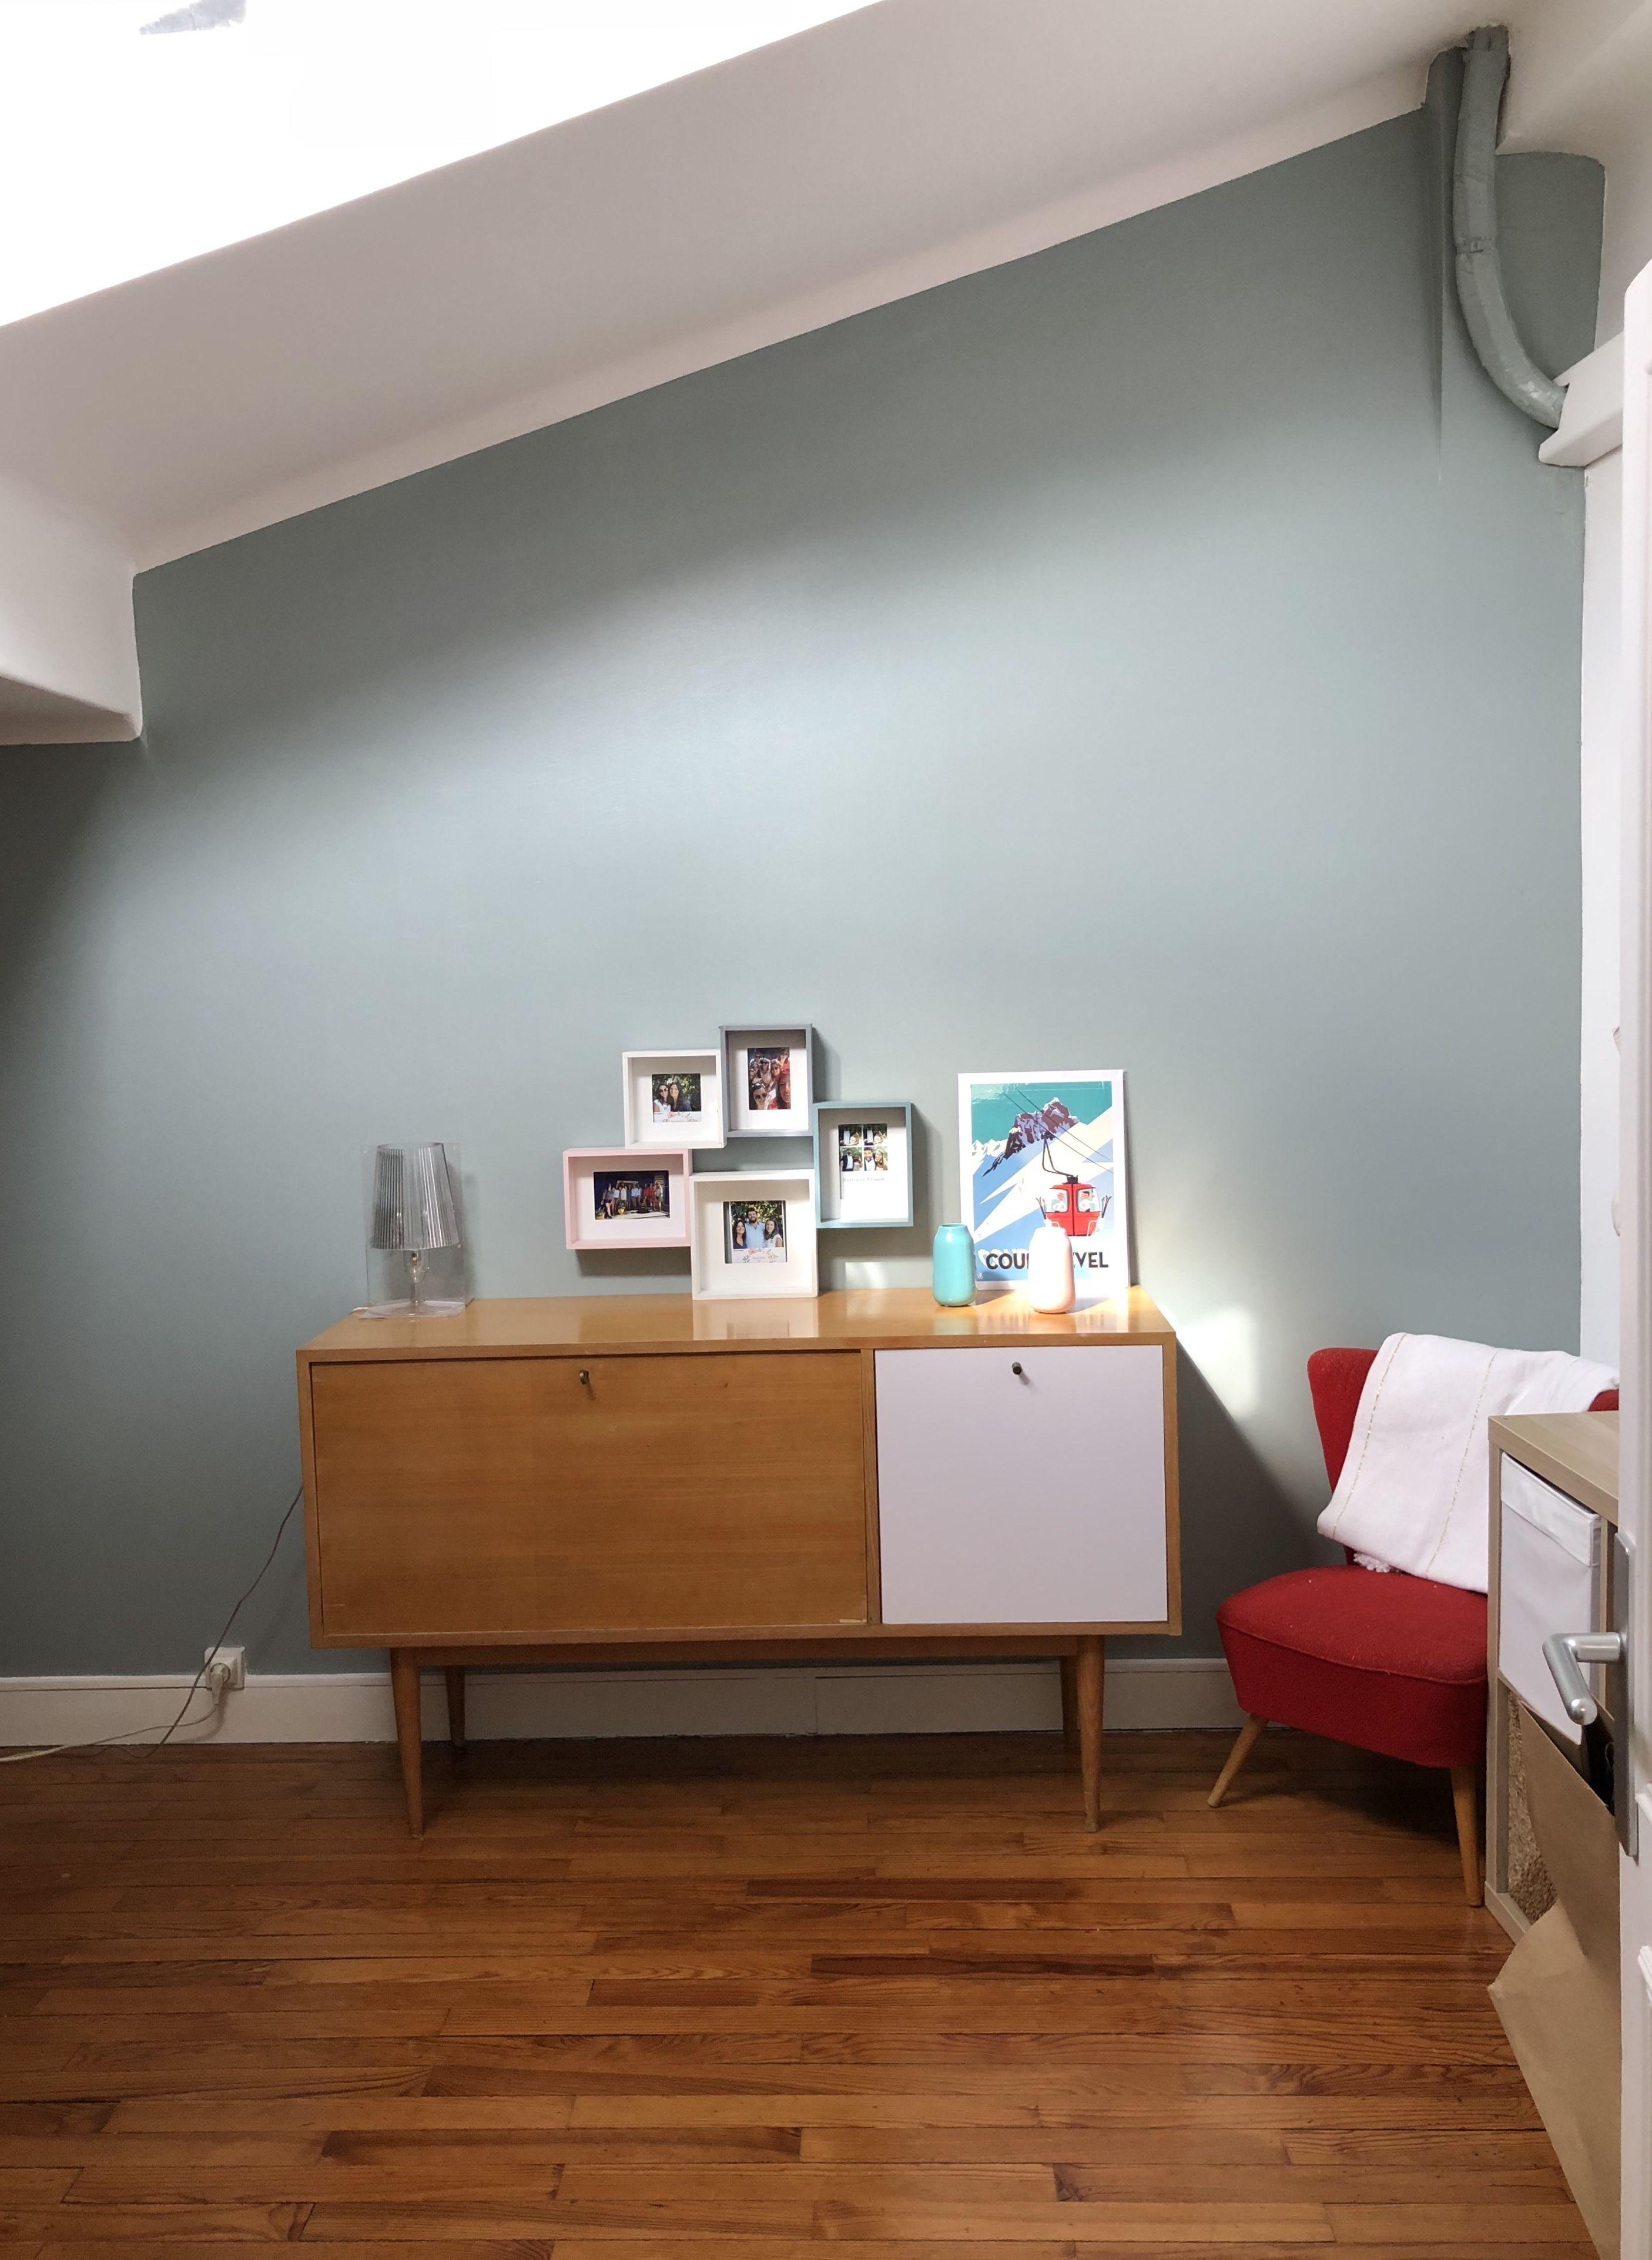 Mur Luxens Satin Sage 4 Gris vert Meuble enfilade | Chambre ...